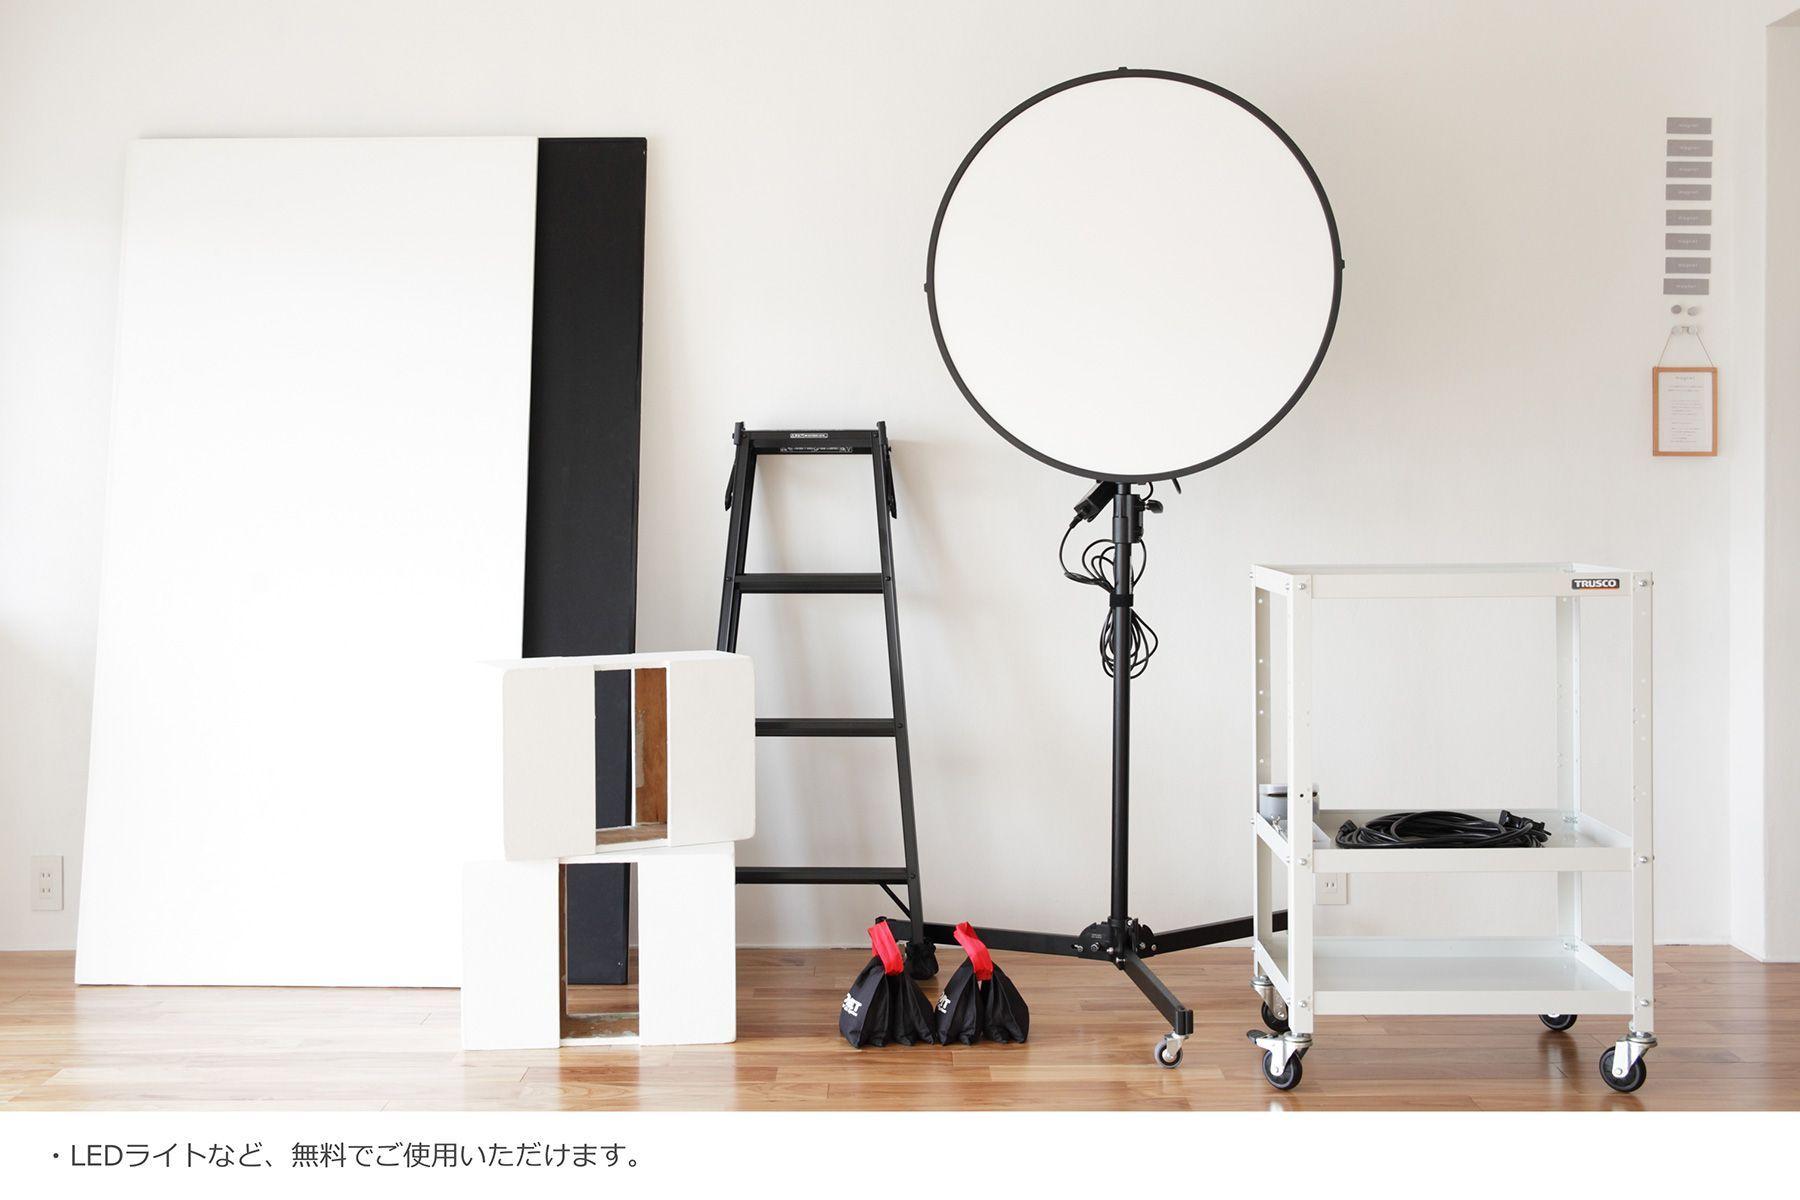 SANAIZAKA 503(サナイザカ 503)LEDライトなど無料貸出